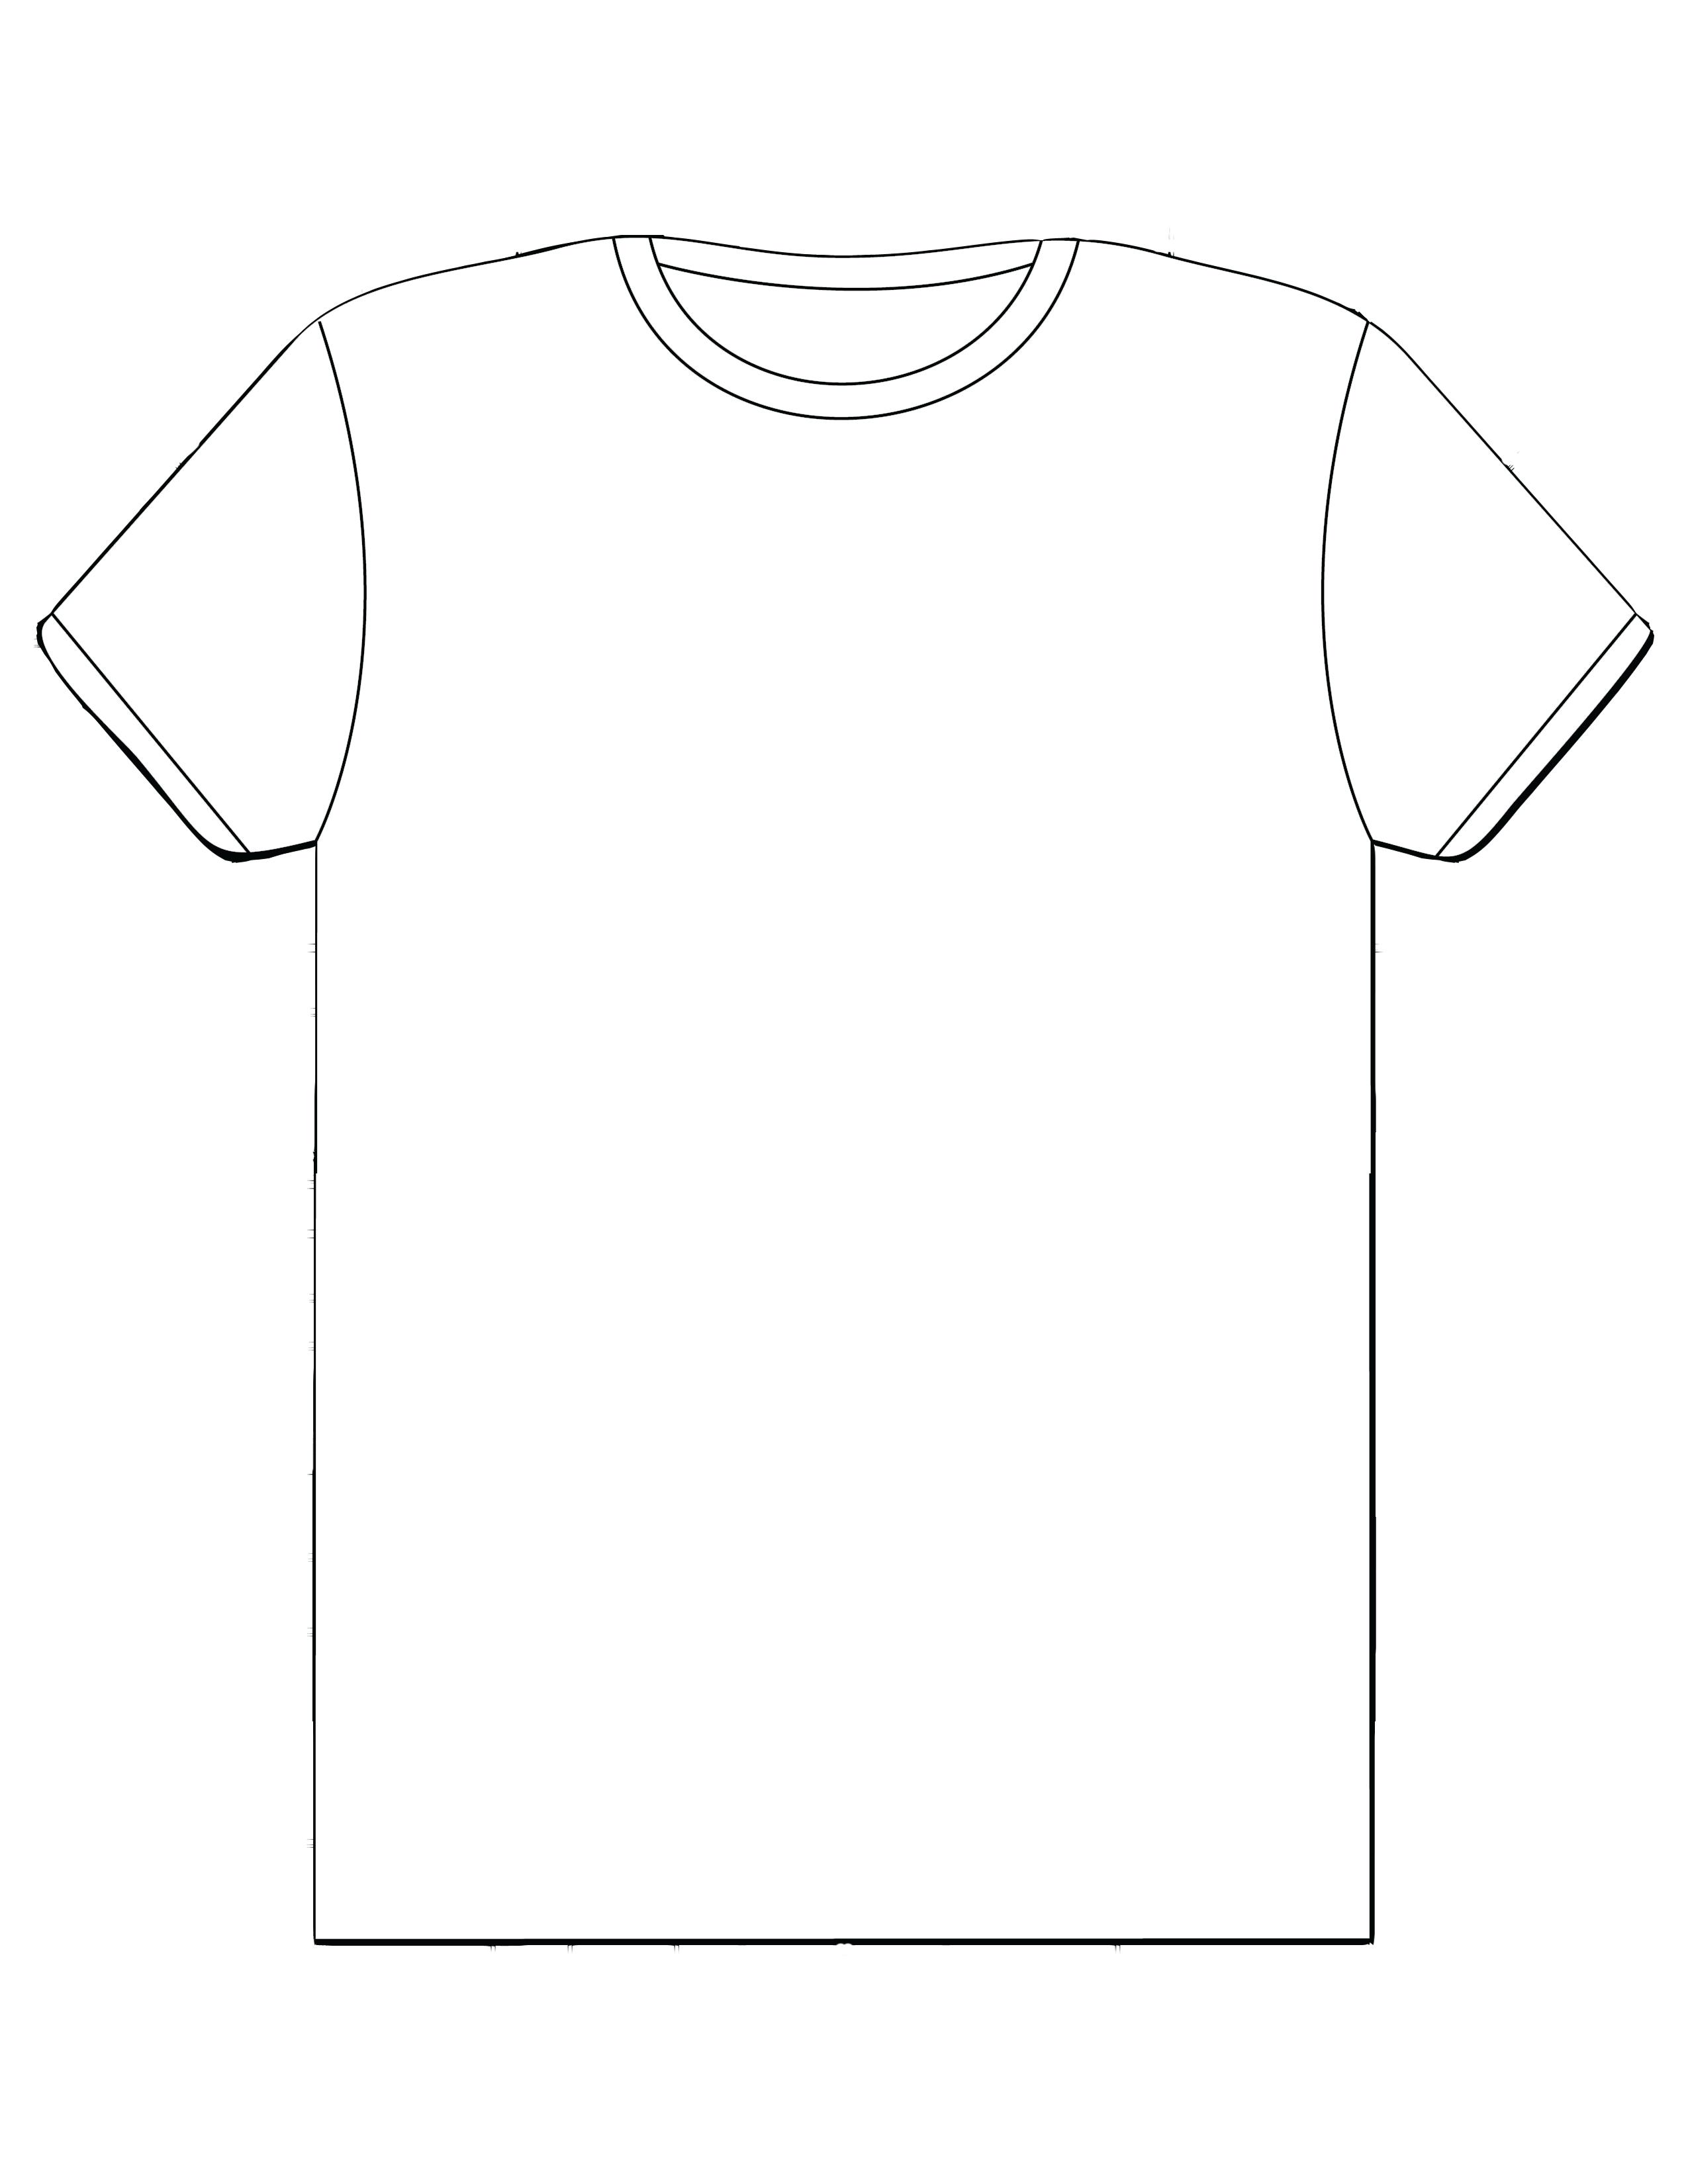 Blank Shirt Design